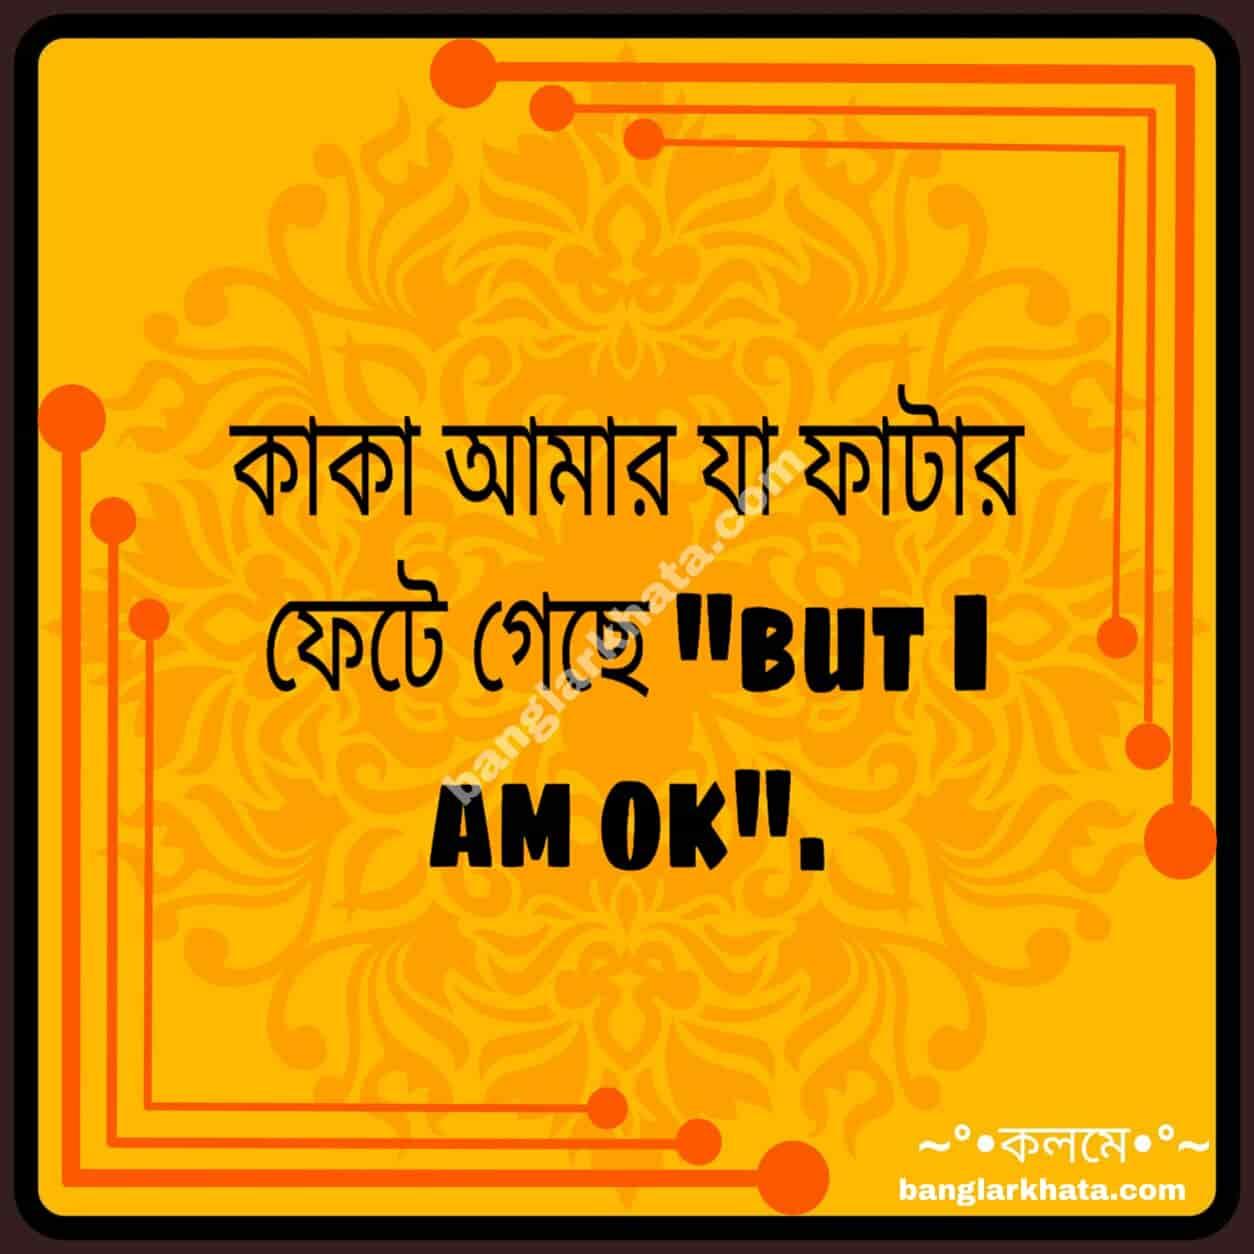 Bangla attitude status for Facebook, whatsapp